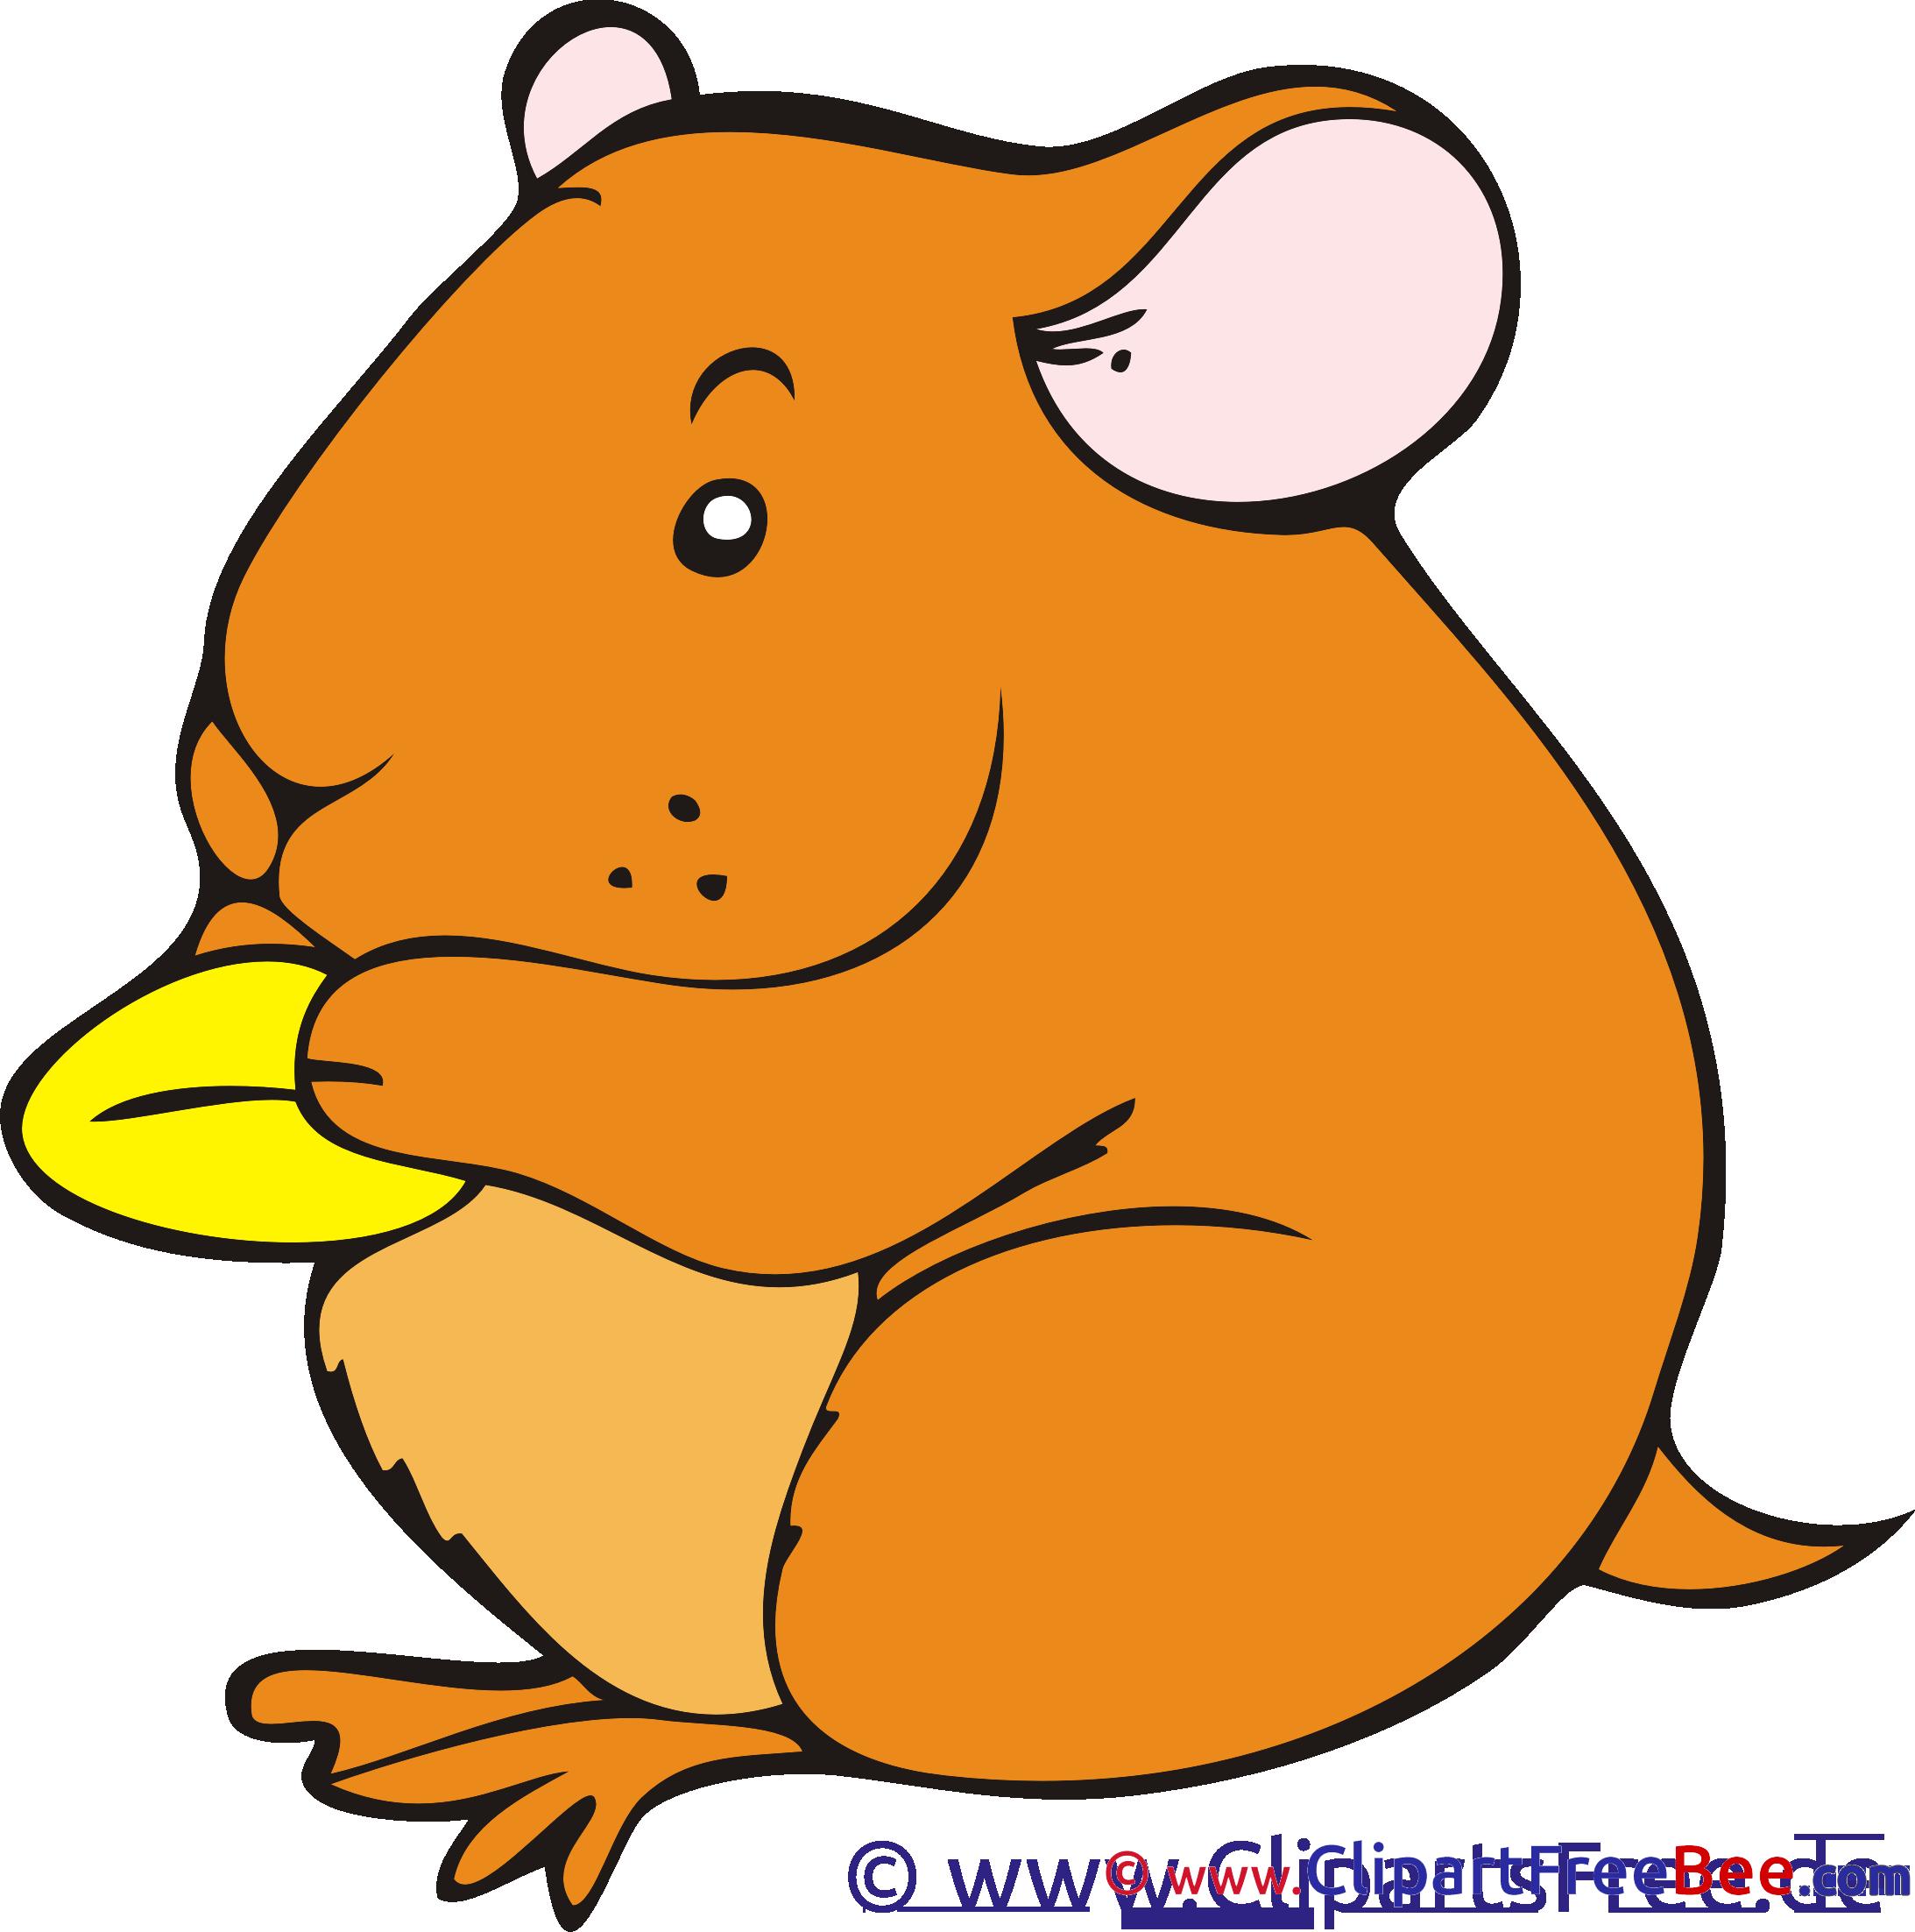 Hamster download printable Illustrations